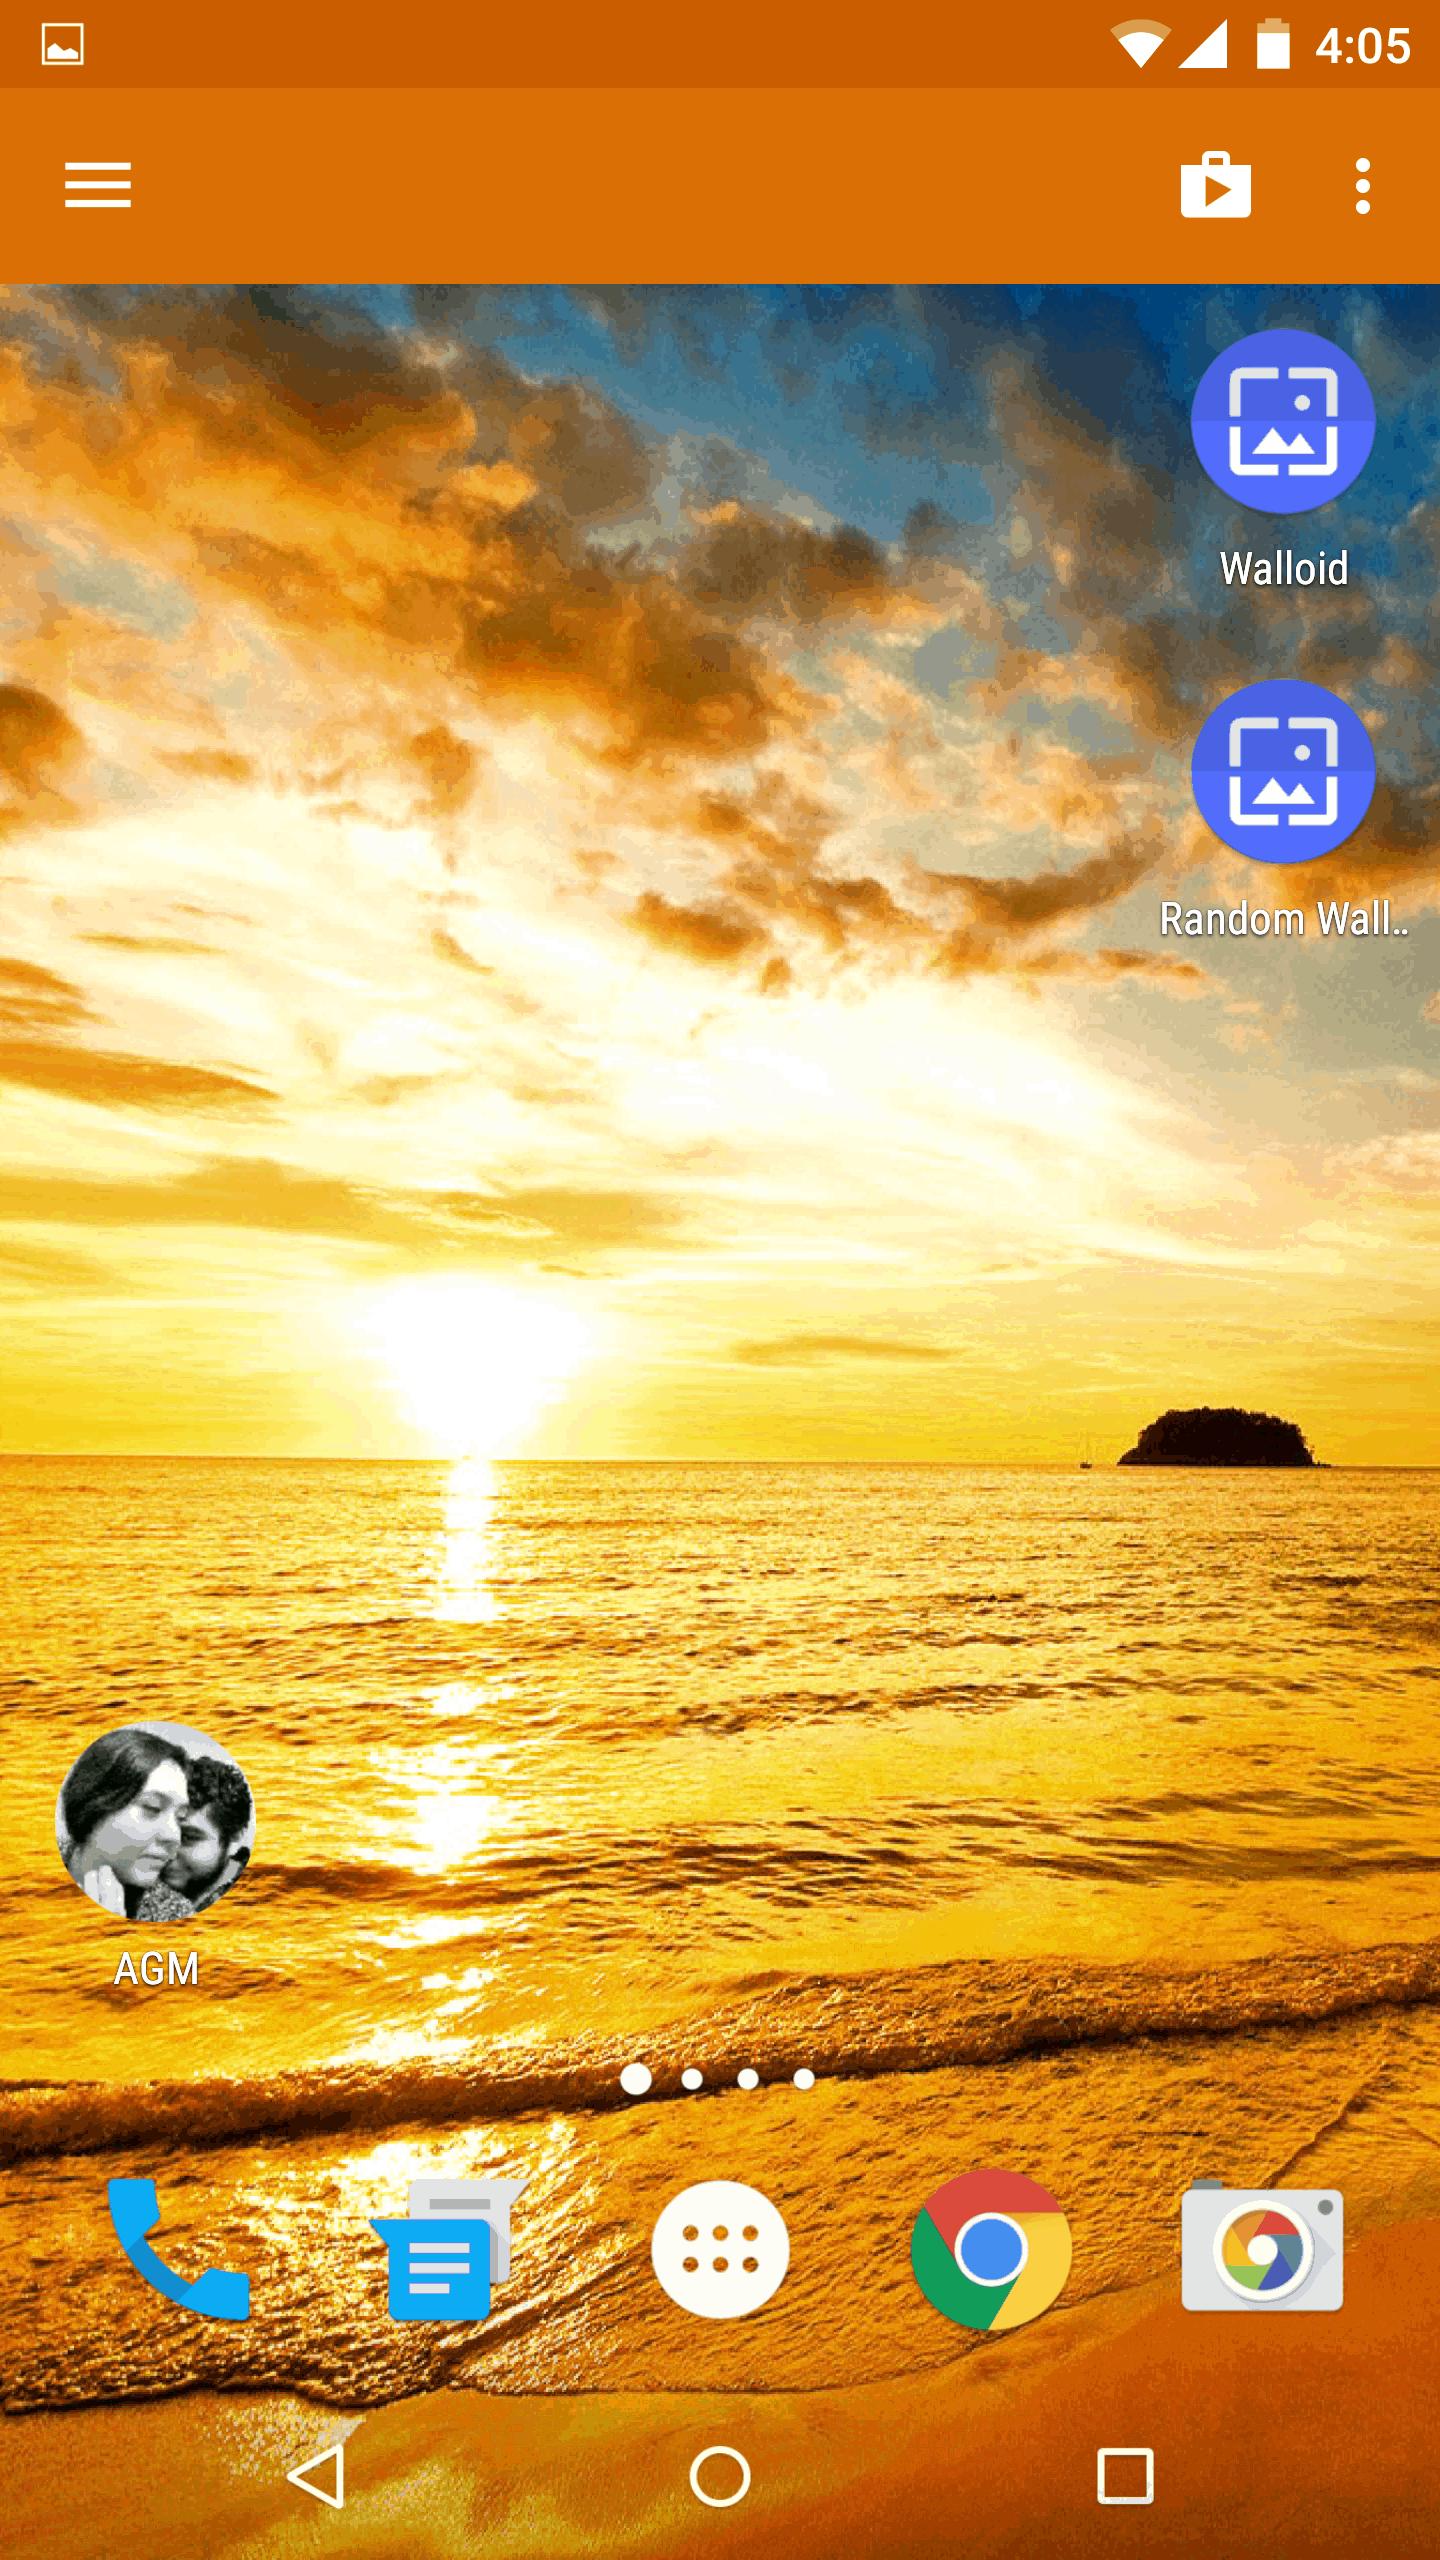 Screenshot 2015 04 26 16 05 42